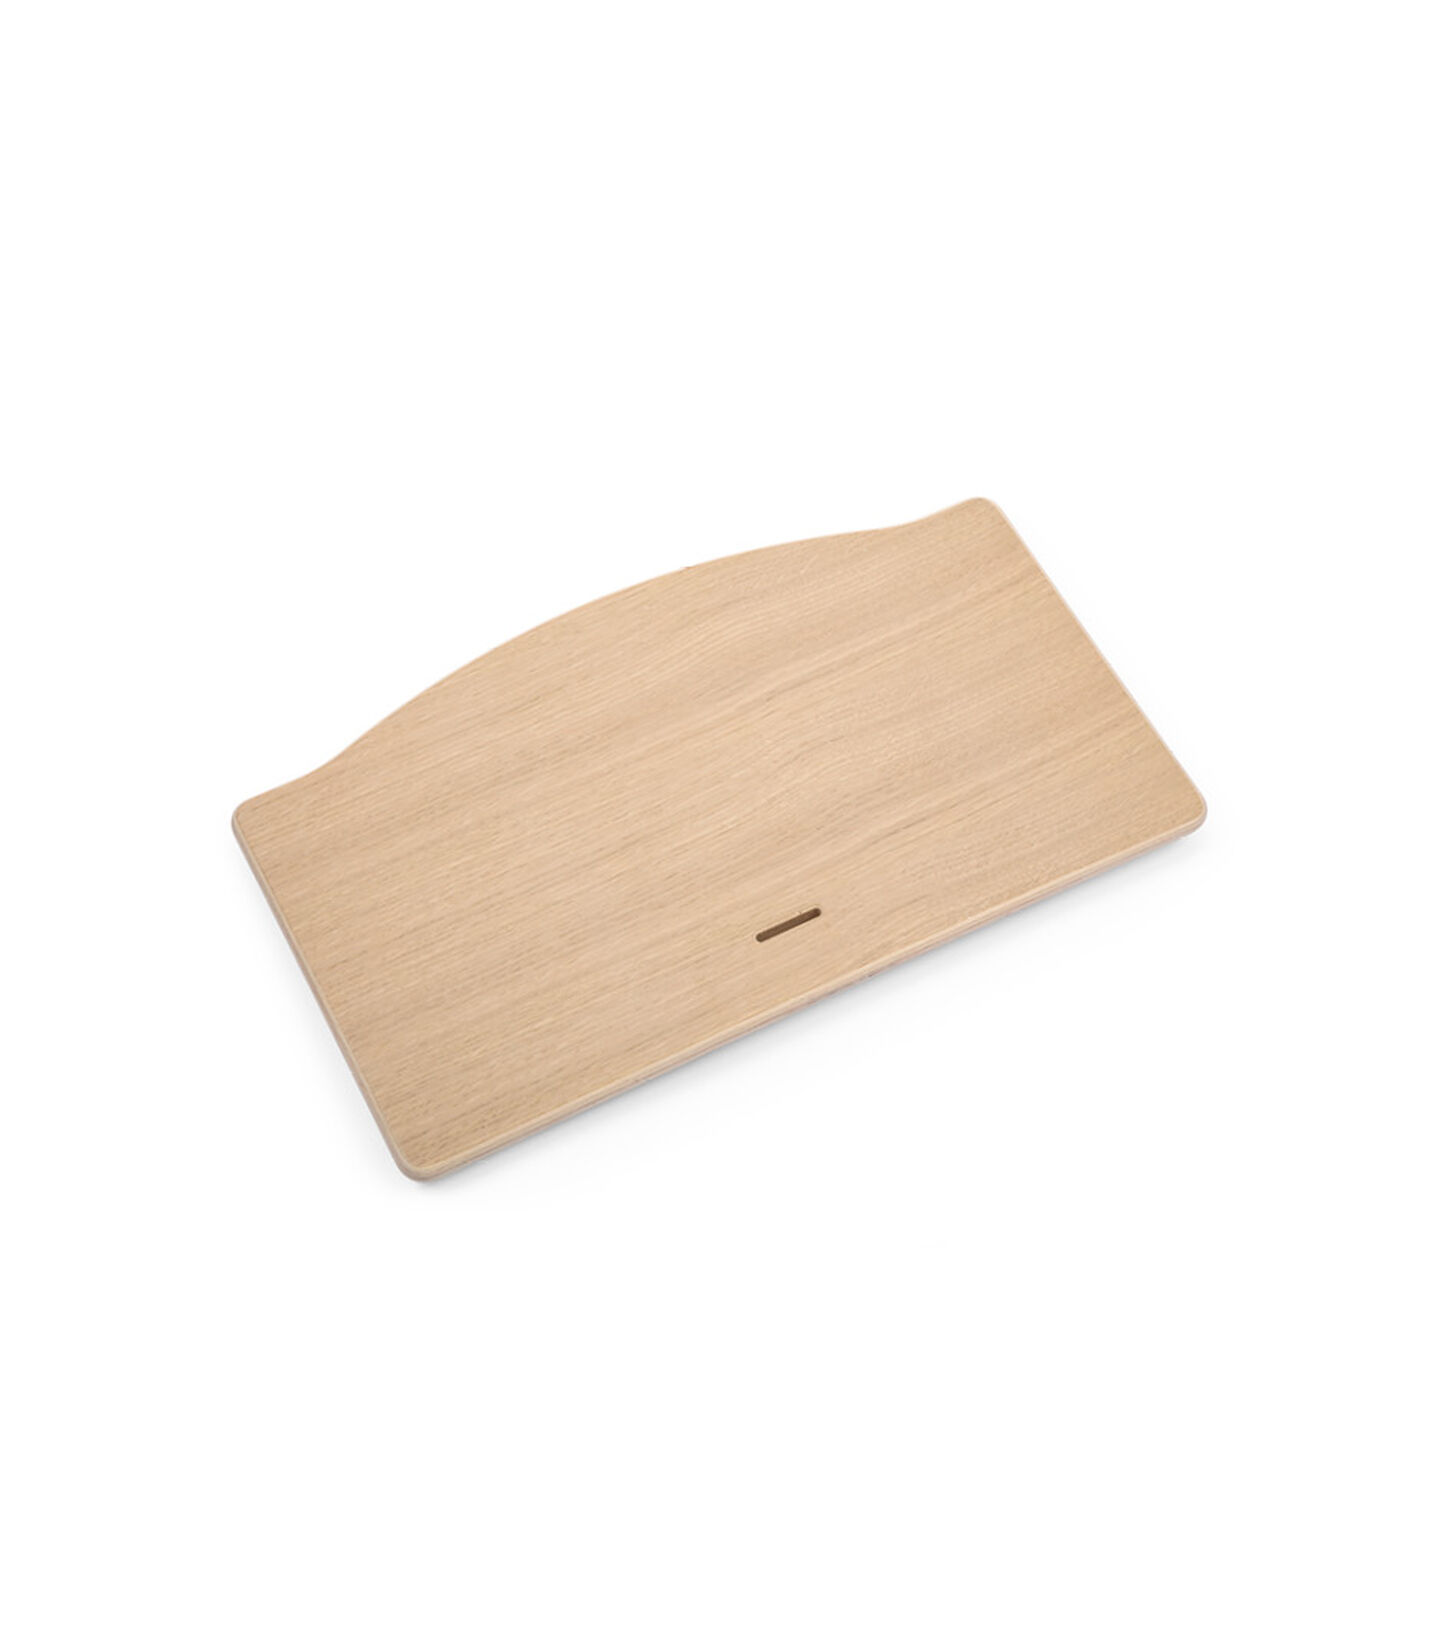 Tripp Trapp® Seatplate Oak White, Oak Natural, mainview view 1